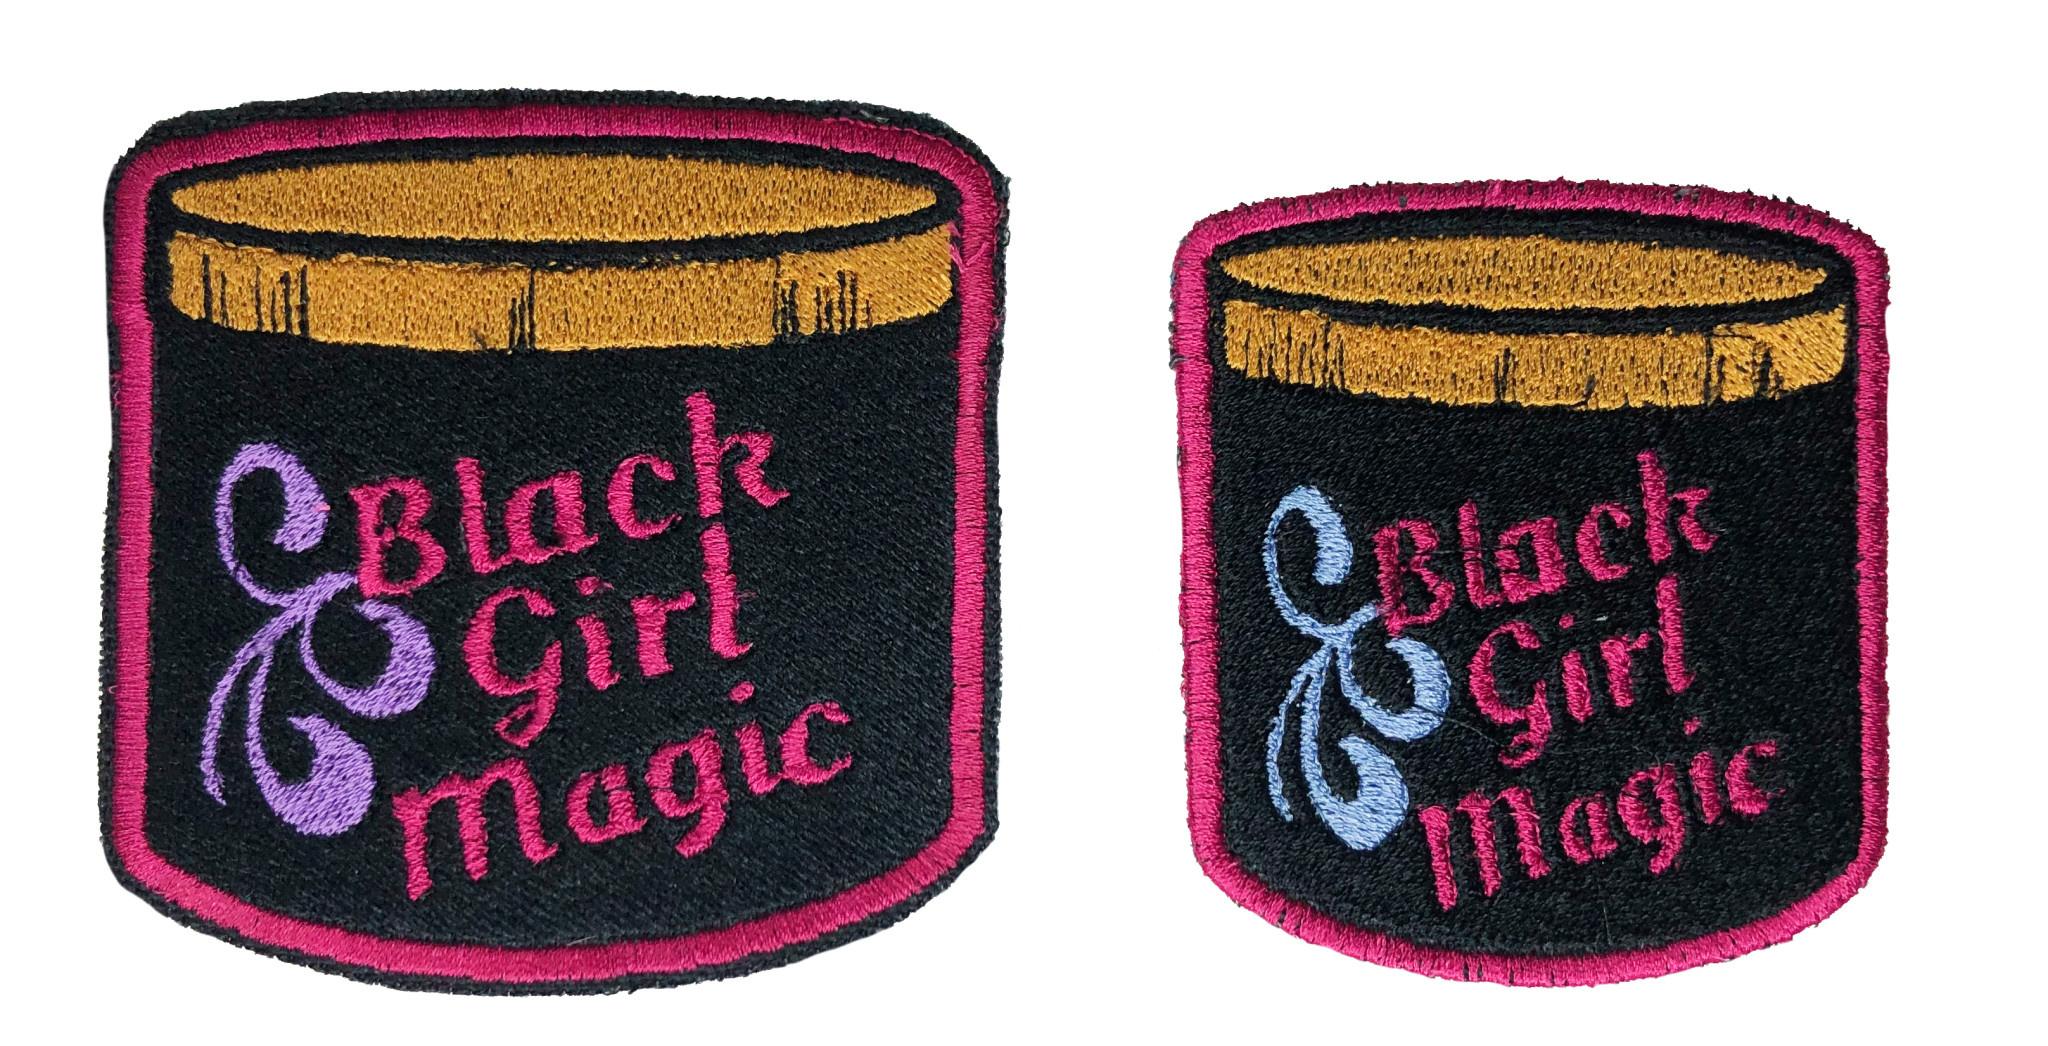 THE SHOP BLACK GIRL MAGIC JAR SMALL PATCH-2